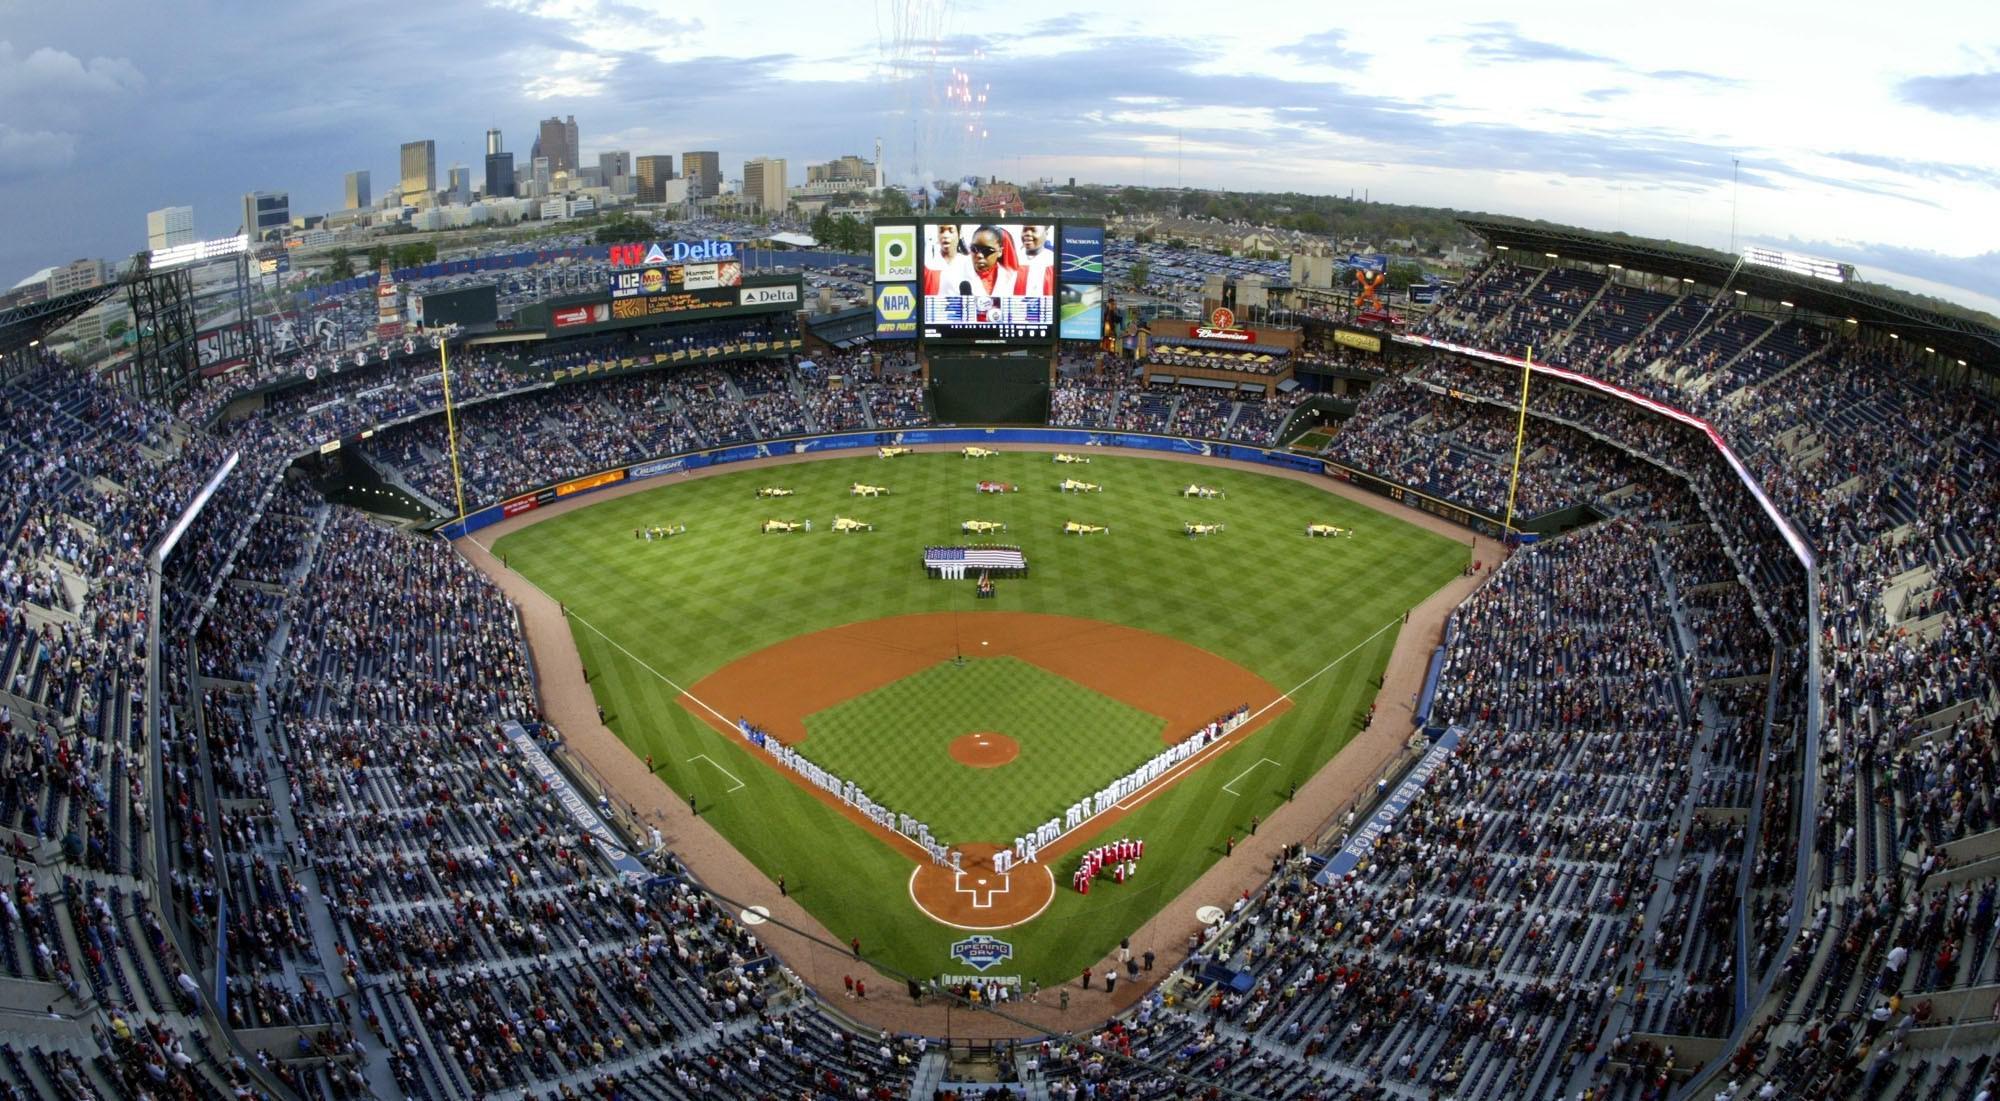 Atlanta Braves moving to new stadium in suburban Cobb County in 2017 –  Washington Times